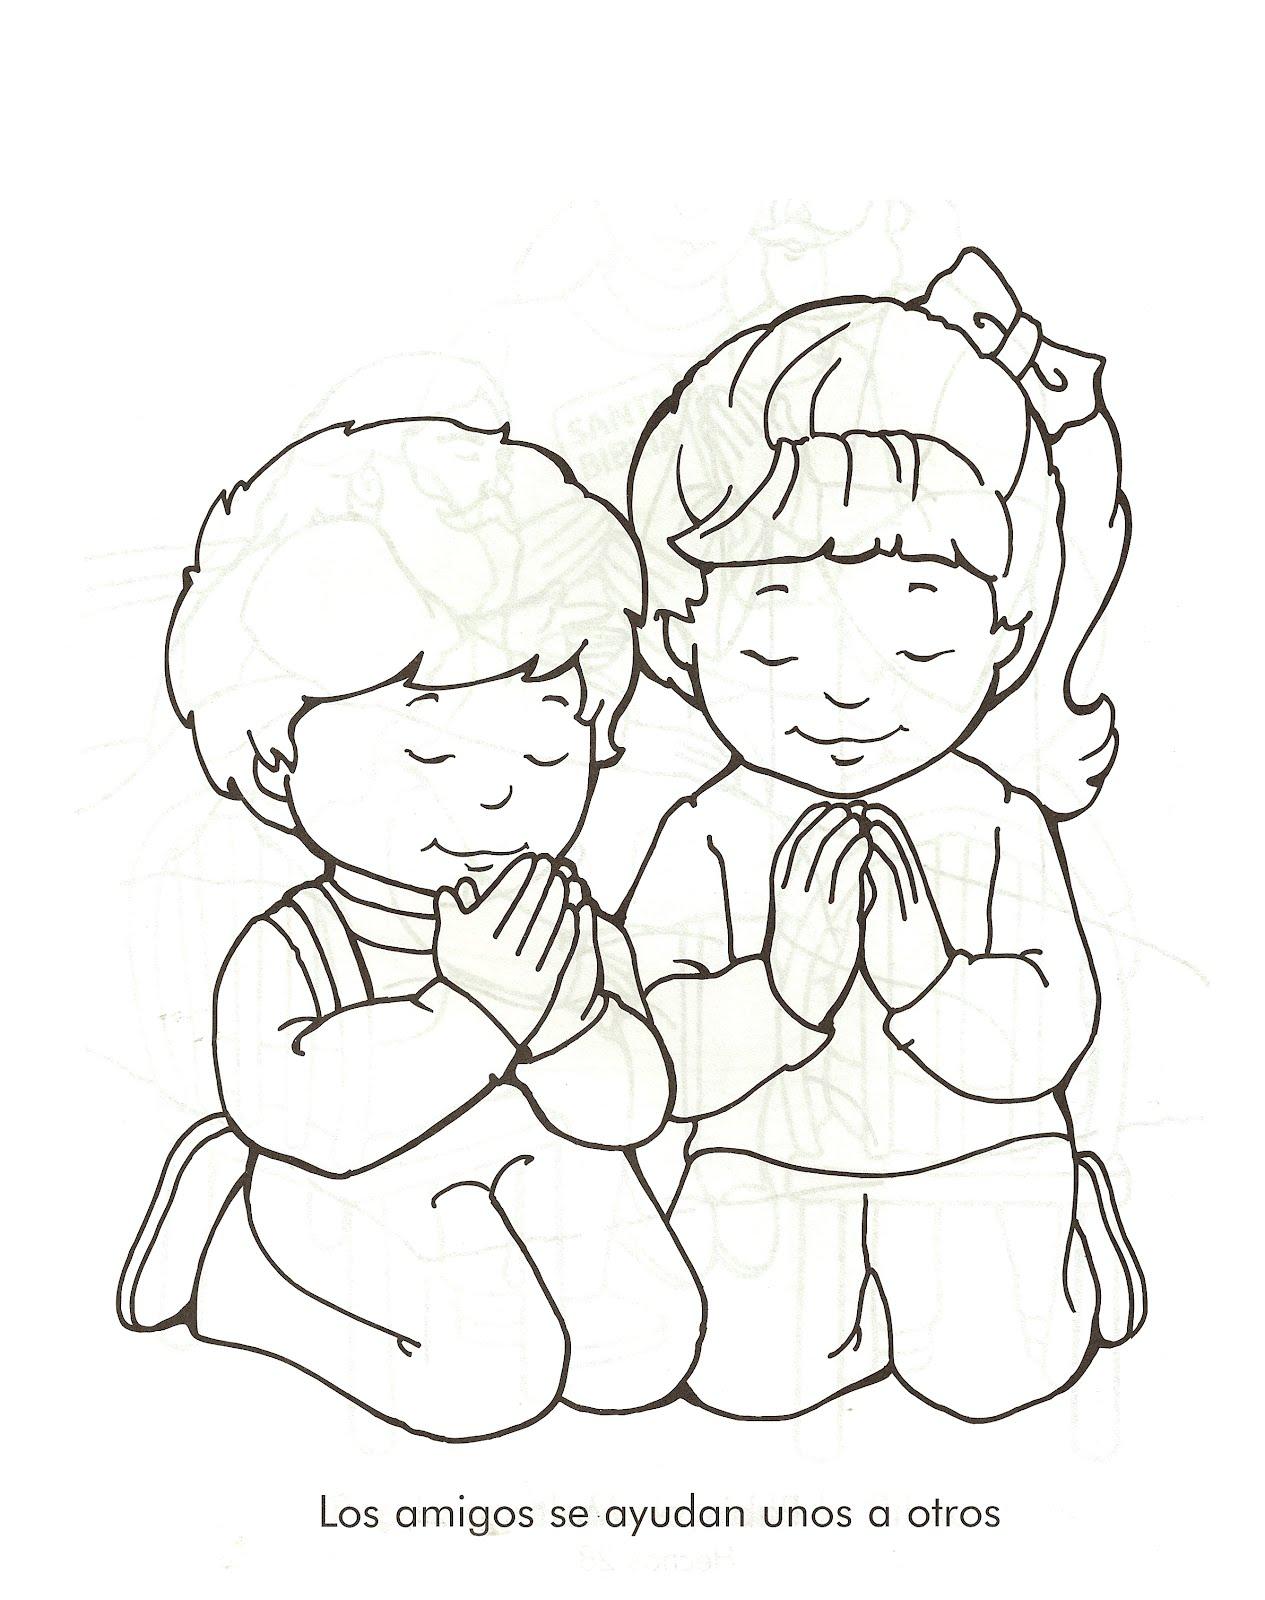 Pinturas de niños orando - Imagui